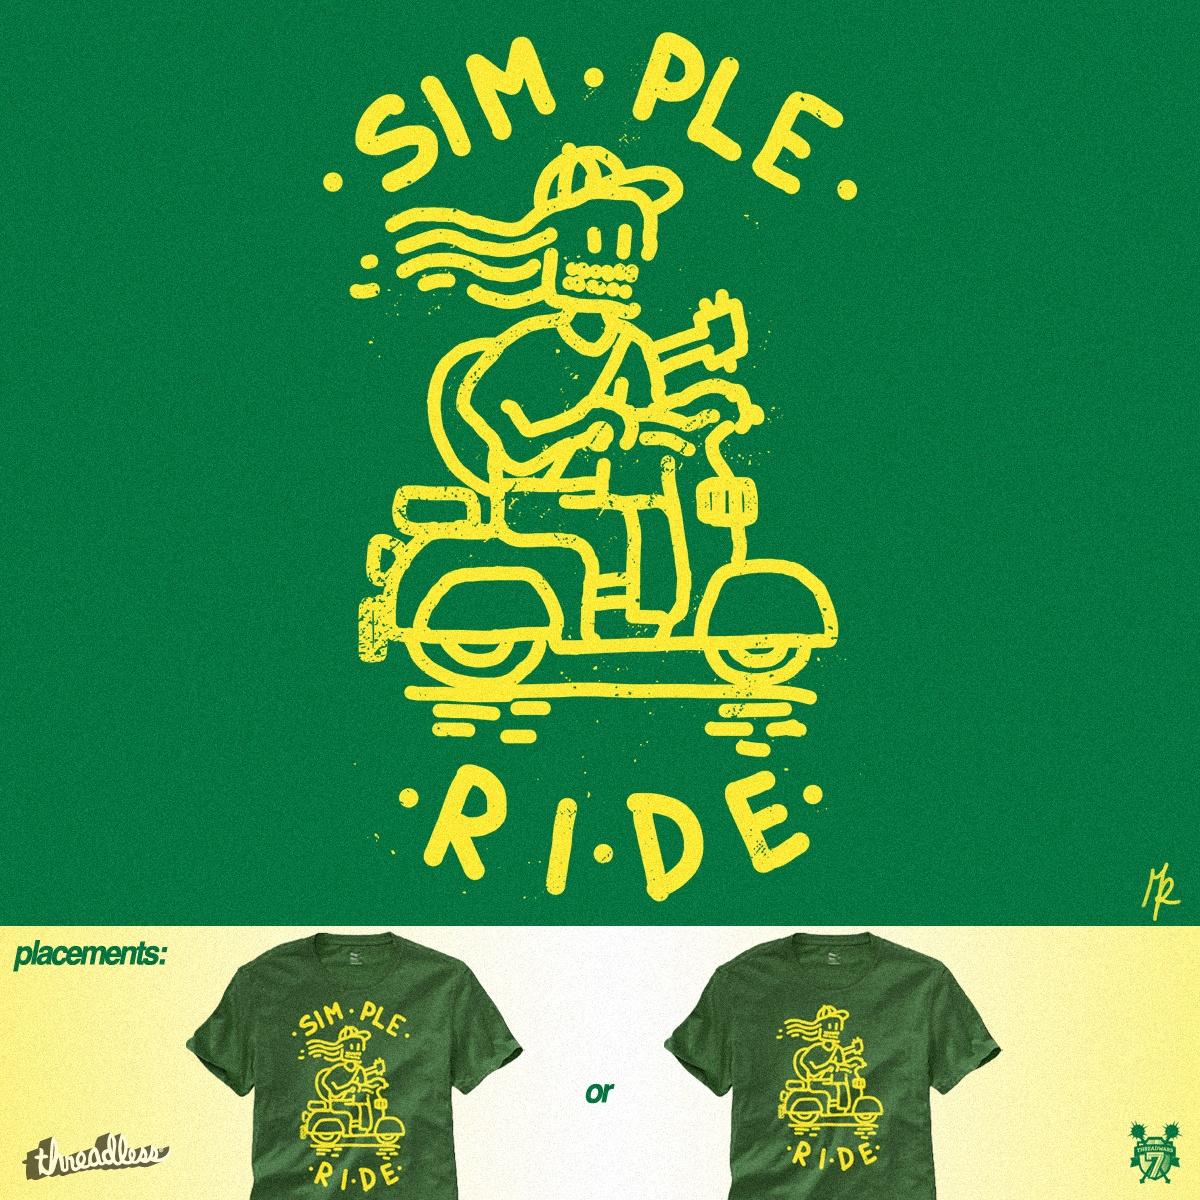 Simple Ride by micheleficeli on Threadless